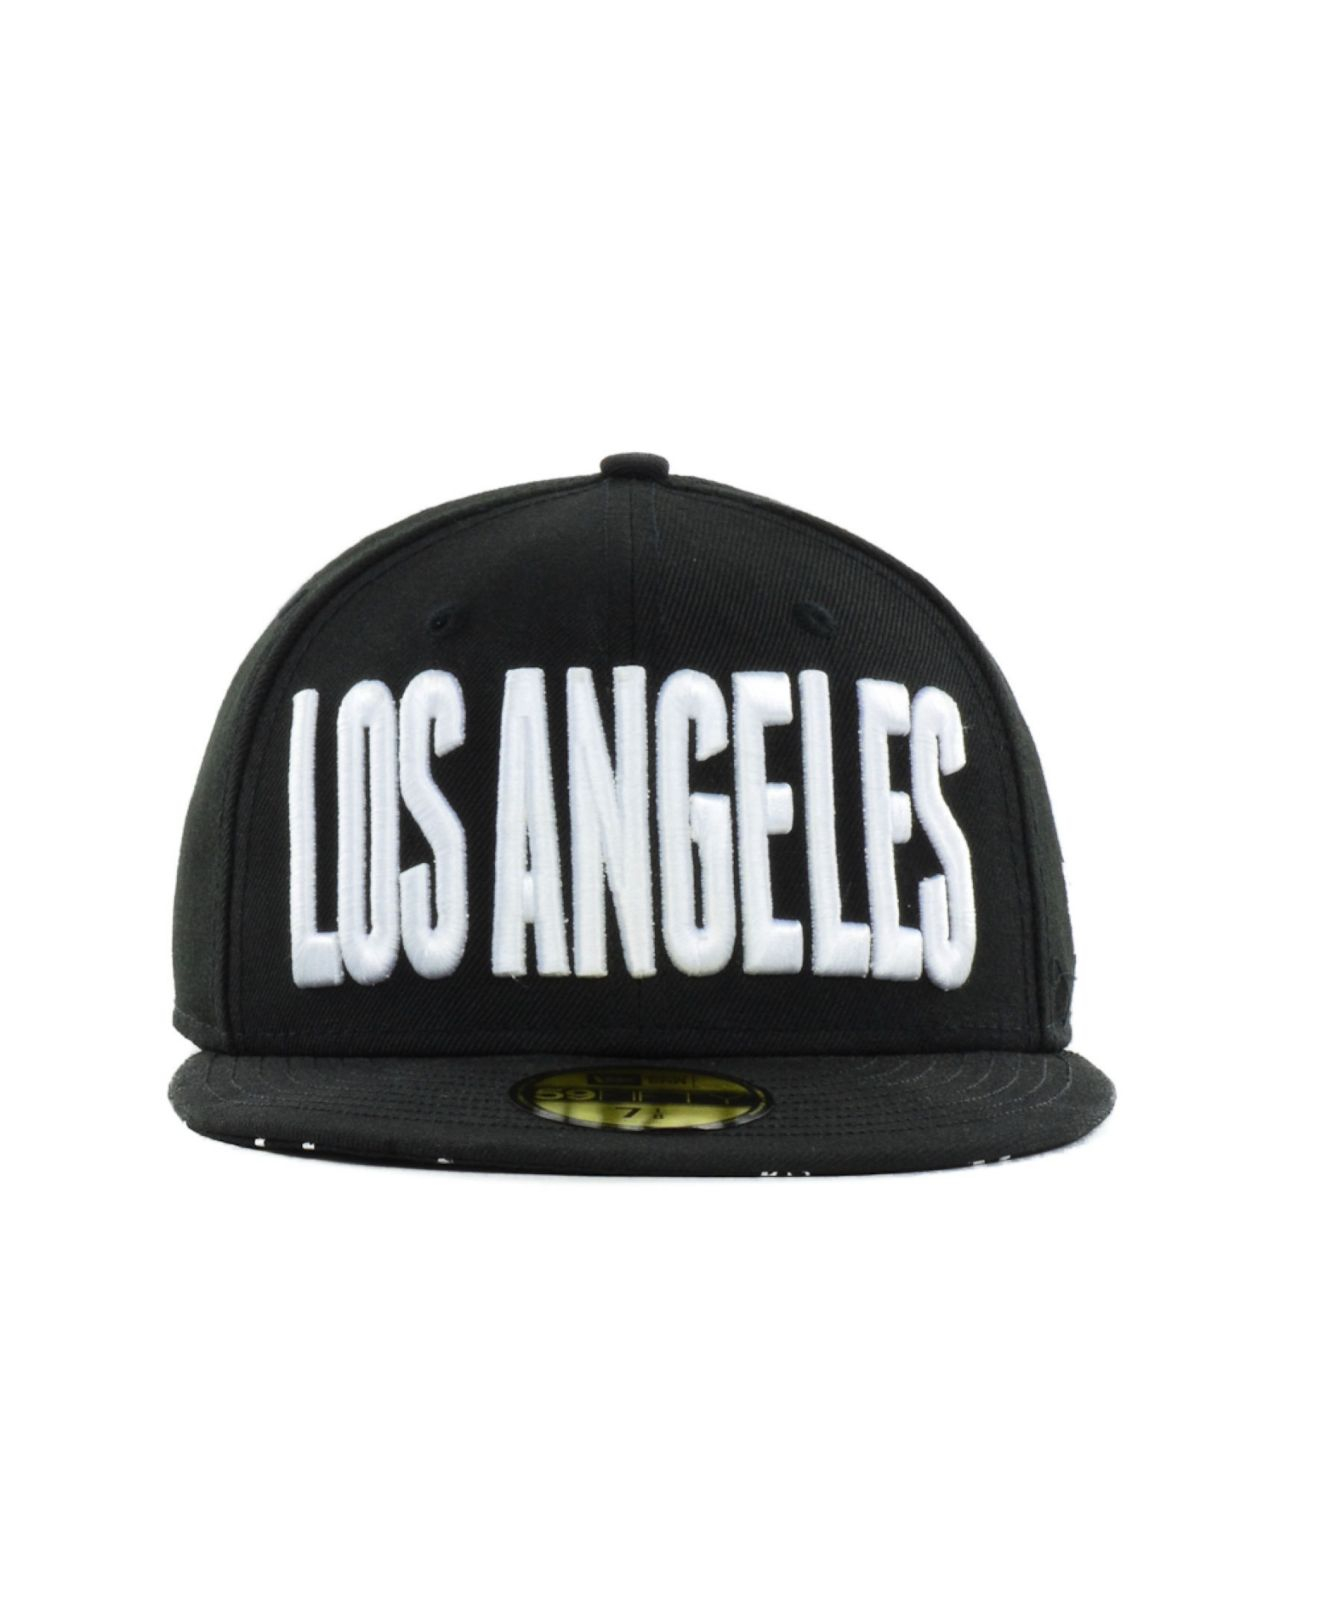 quality design 70b9c 10fe1 ... ireland lyst ktz los angeles dodgers big gps 59fifty cap in black for  men fd24a d78b9